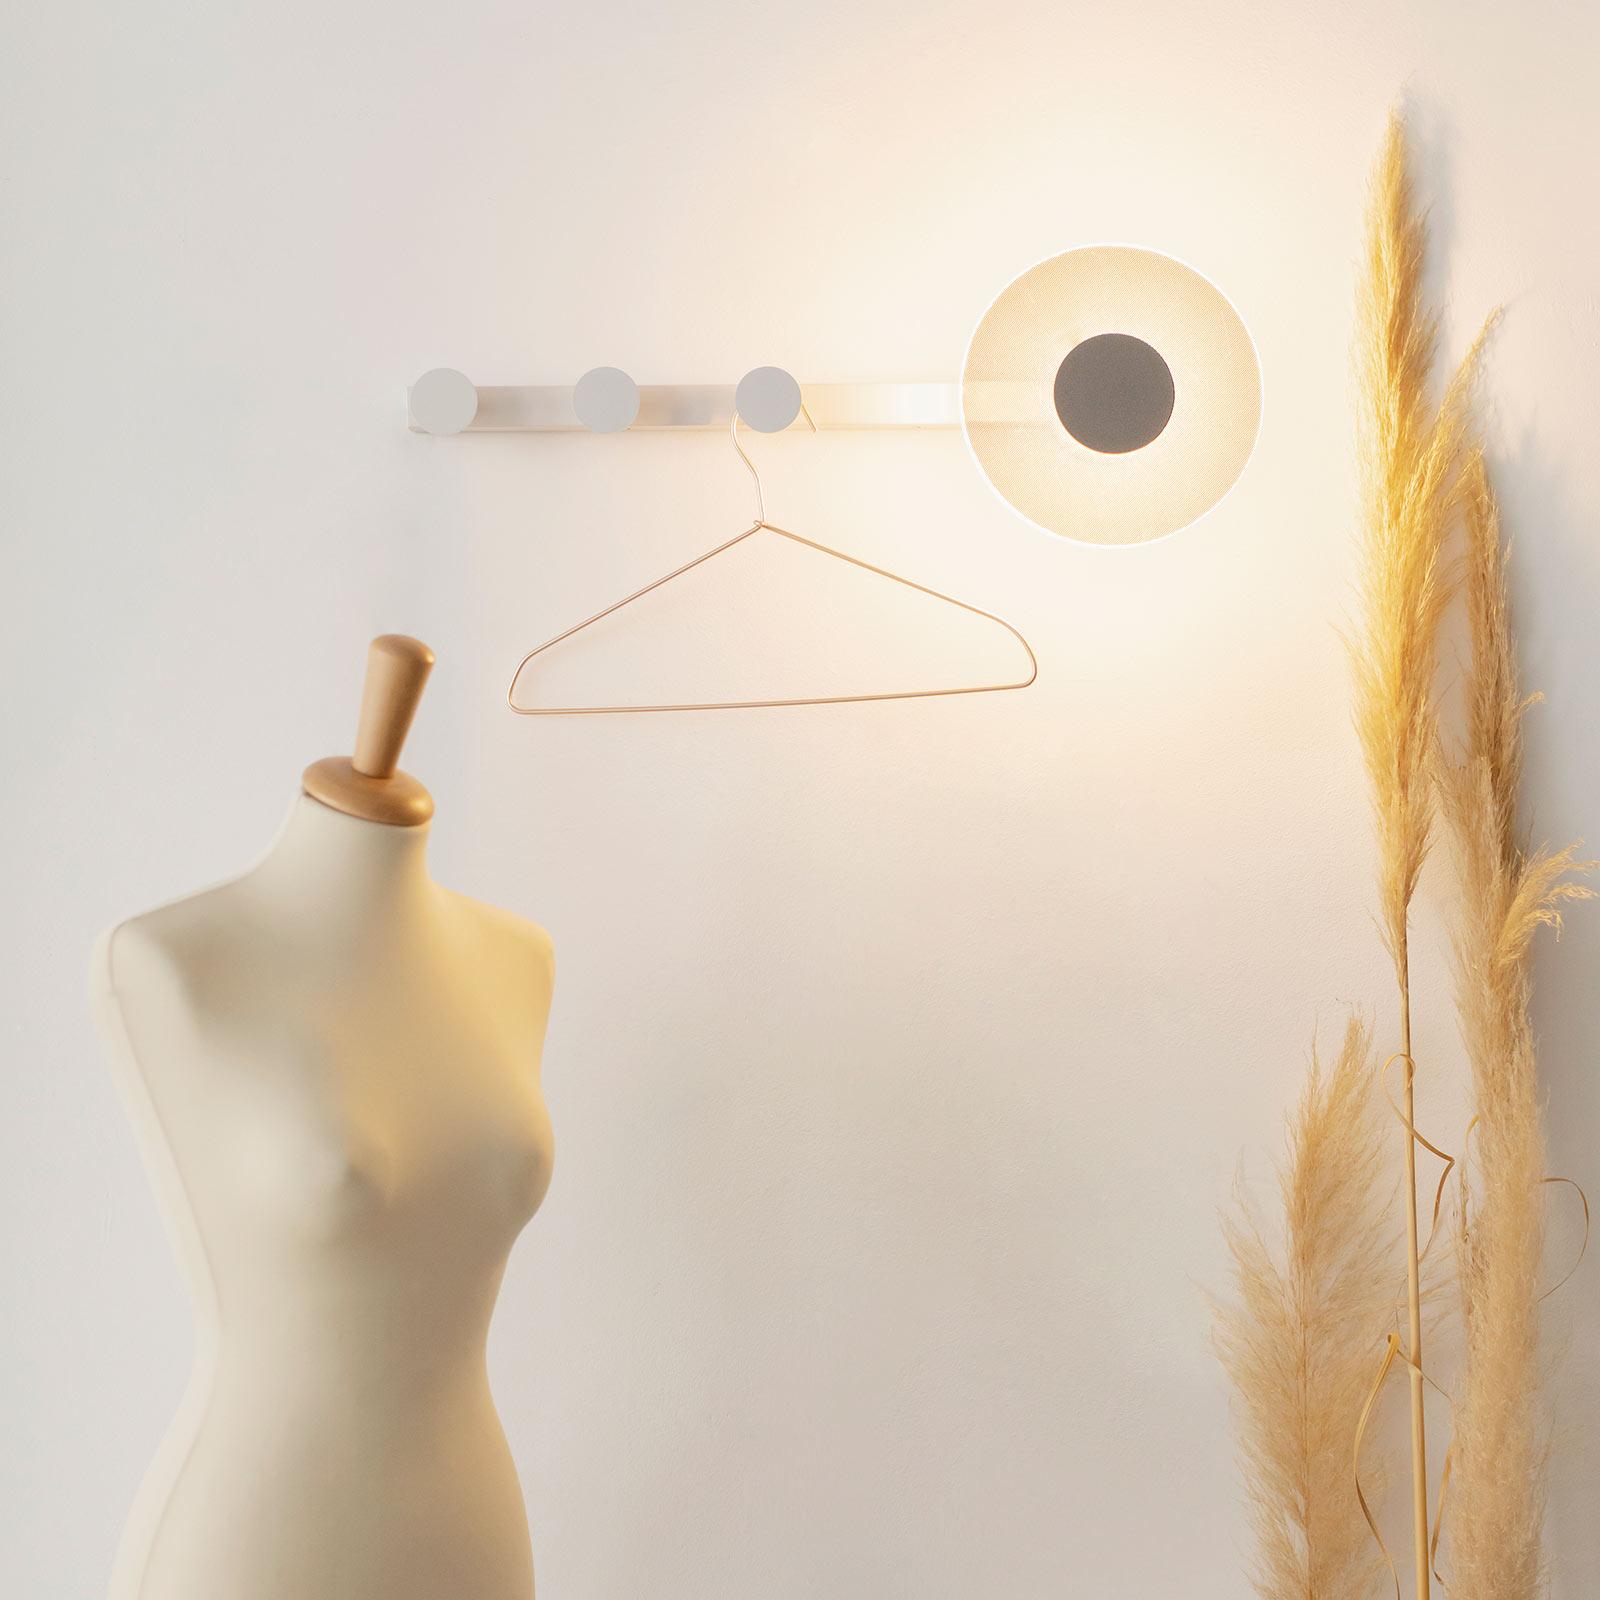 LED wandlamp Venus met kledinghaak, wit